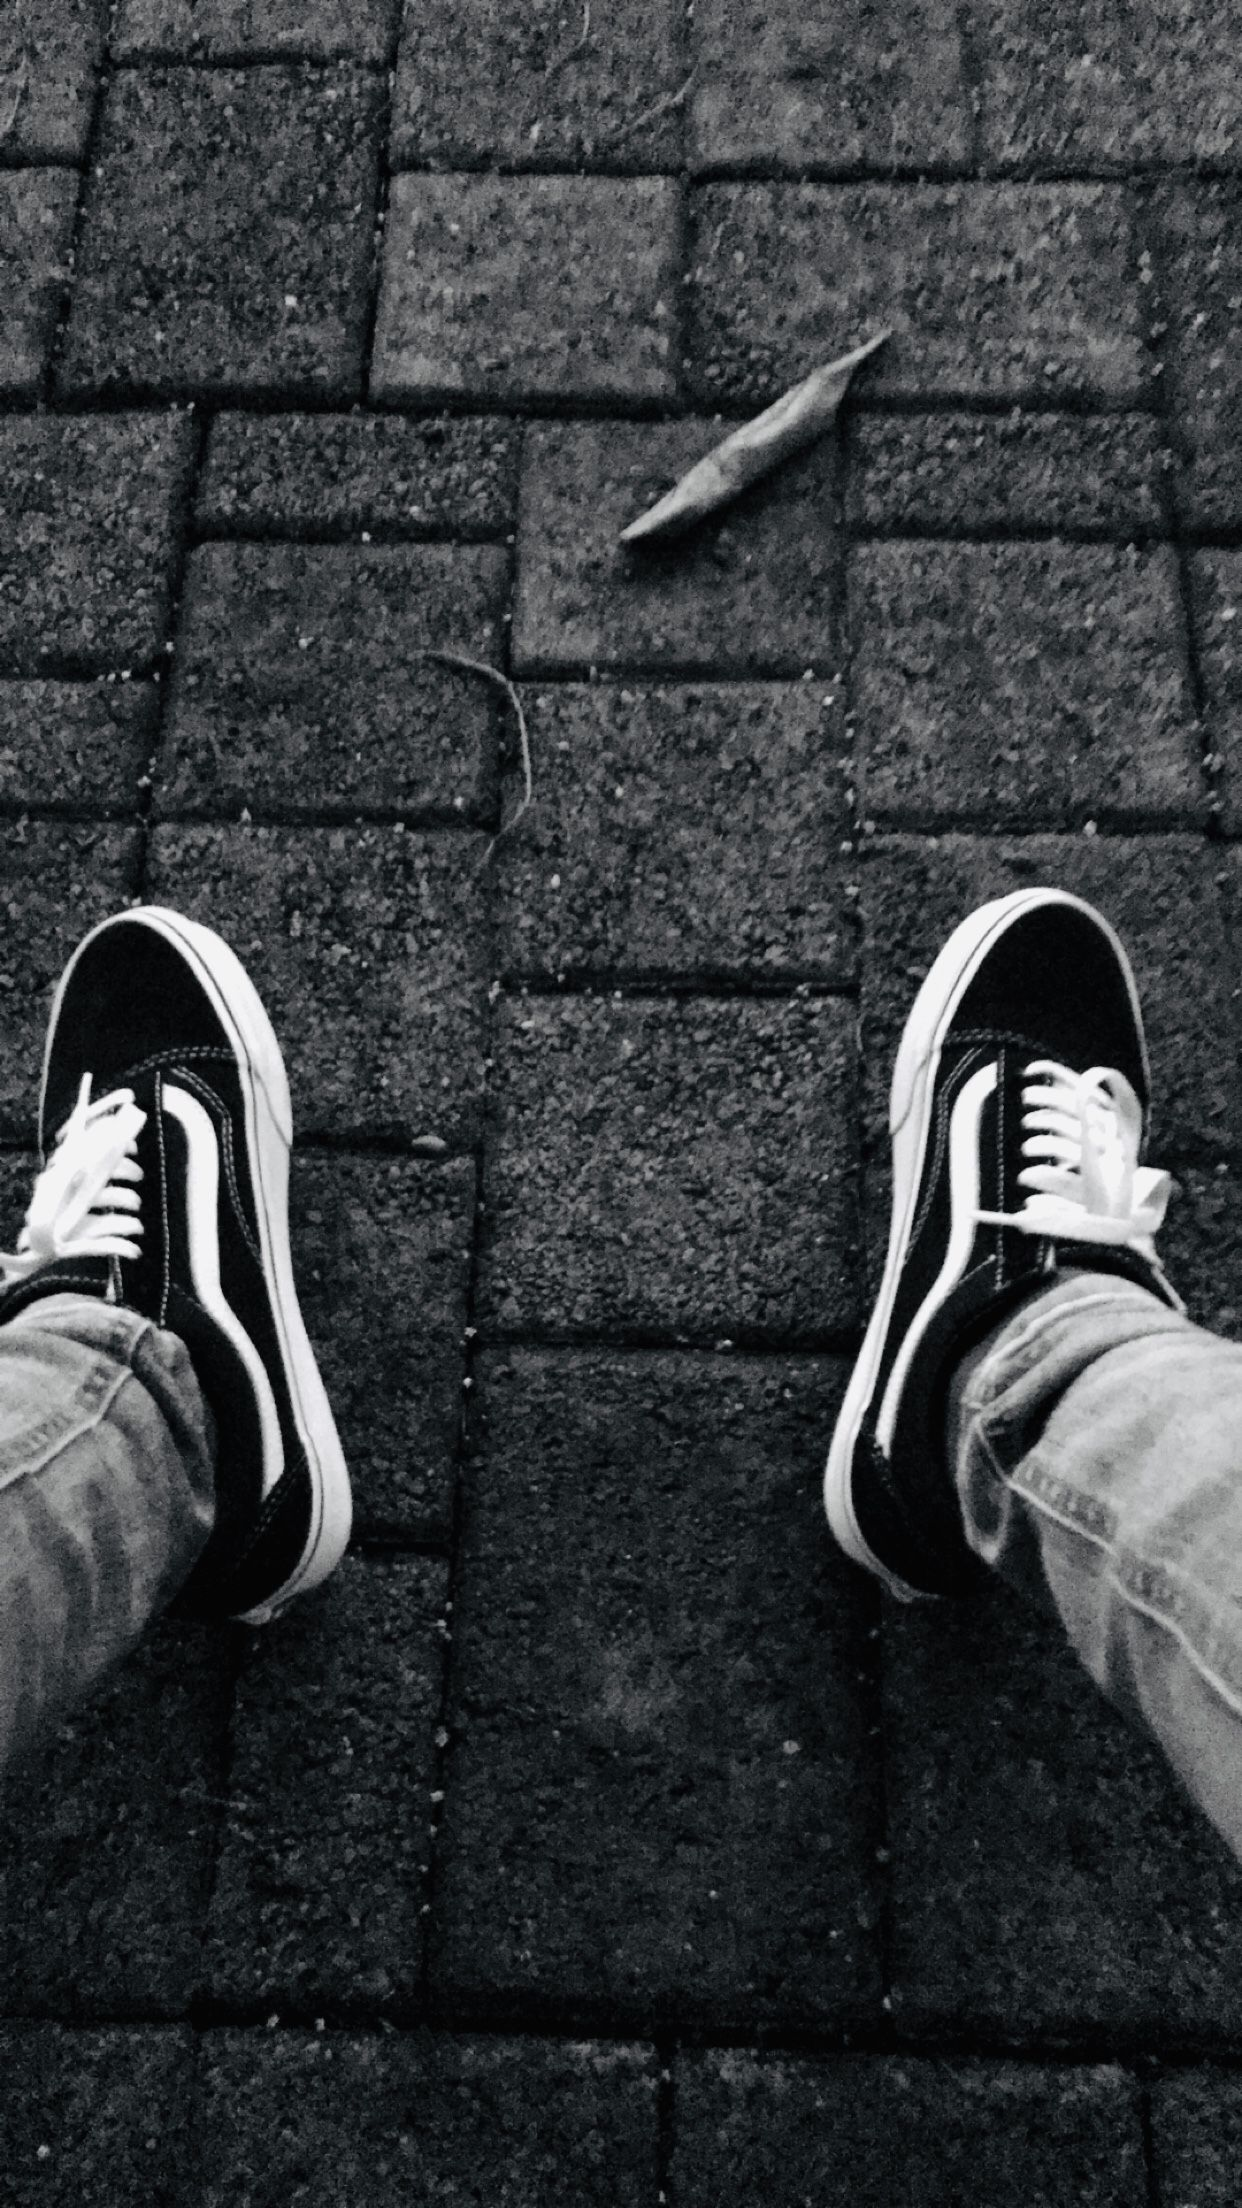 Vans skinnyjeans blackandwhitephotography blackandwhite i love vans 🔥